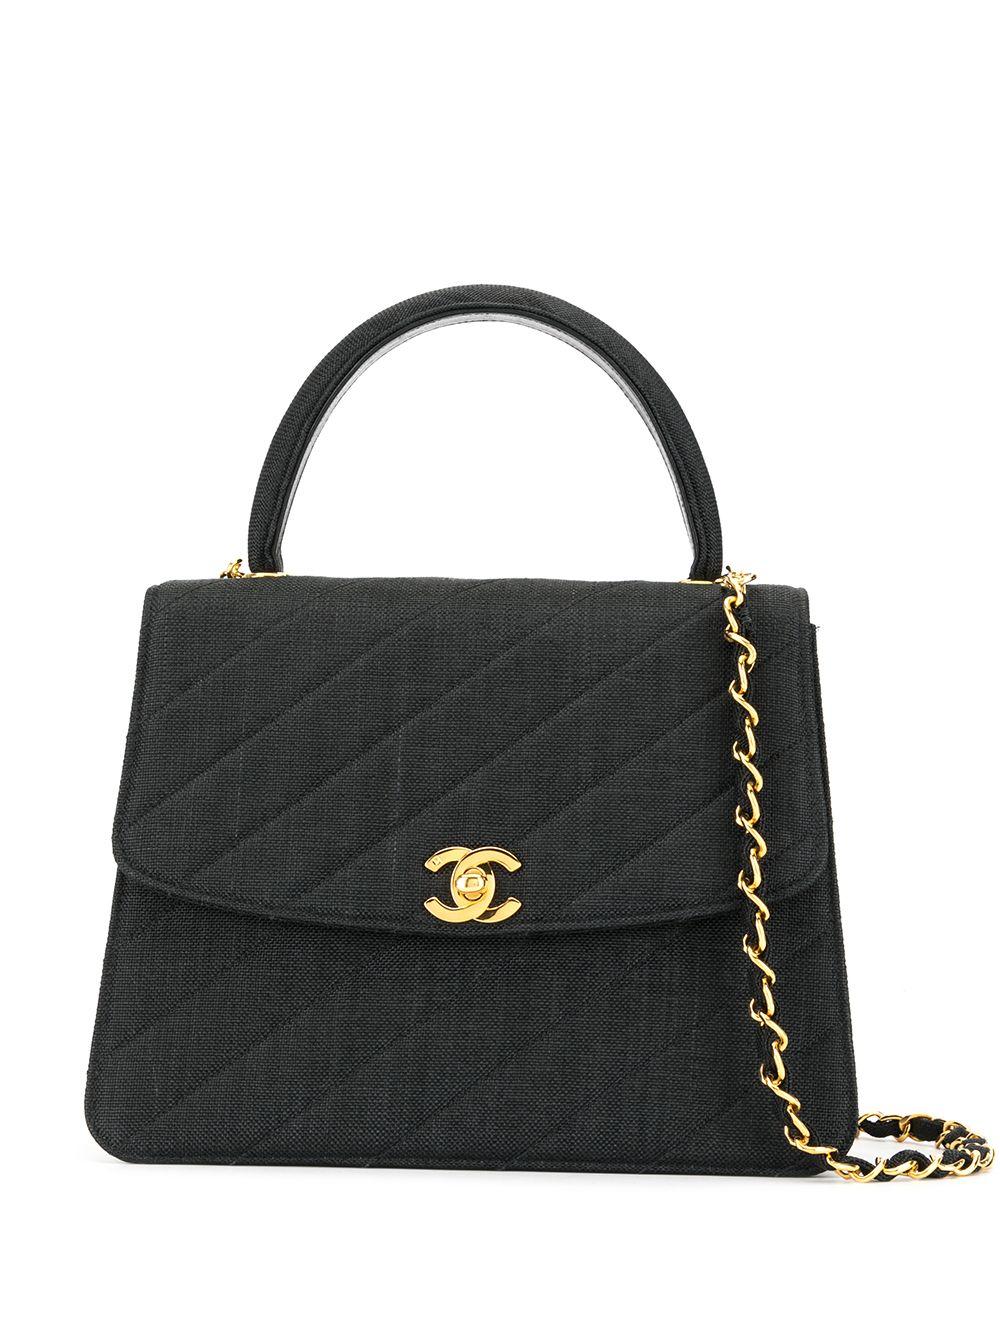 Chanel Pre-Owned 1992s Handtasche - Schwarz